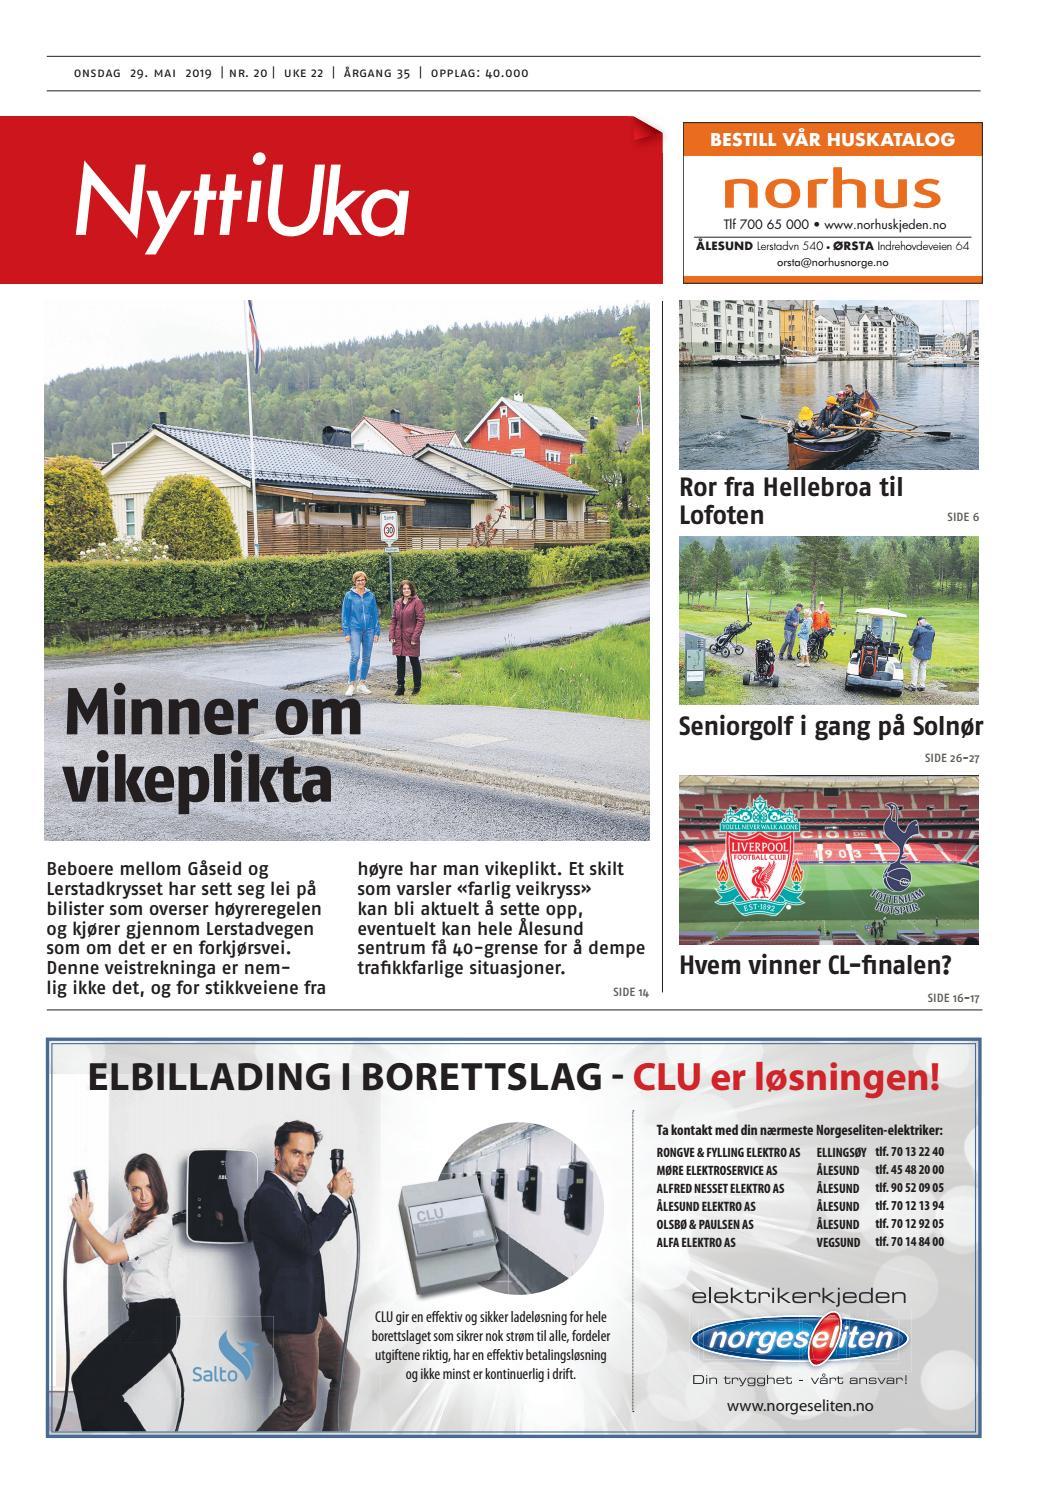 171cabdb Nytt i Uka 29.05.19 by Nytt i Uka - issuu